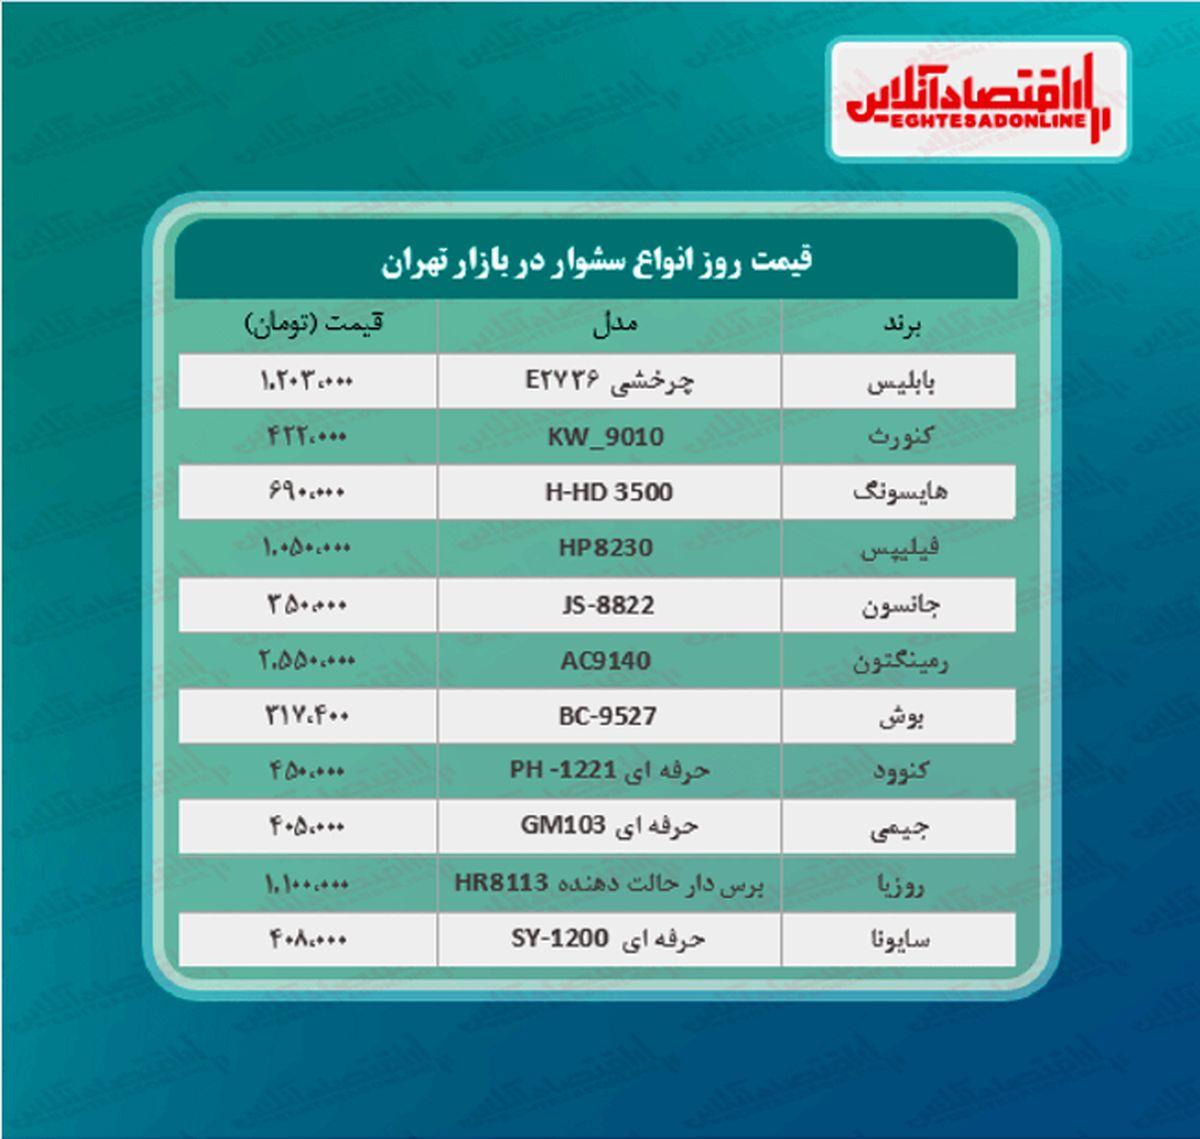 قیمت جدید سشوار (خرداد ۱۴۰۰)